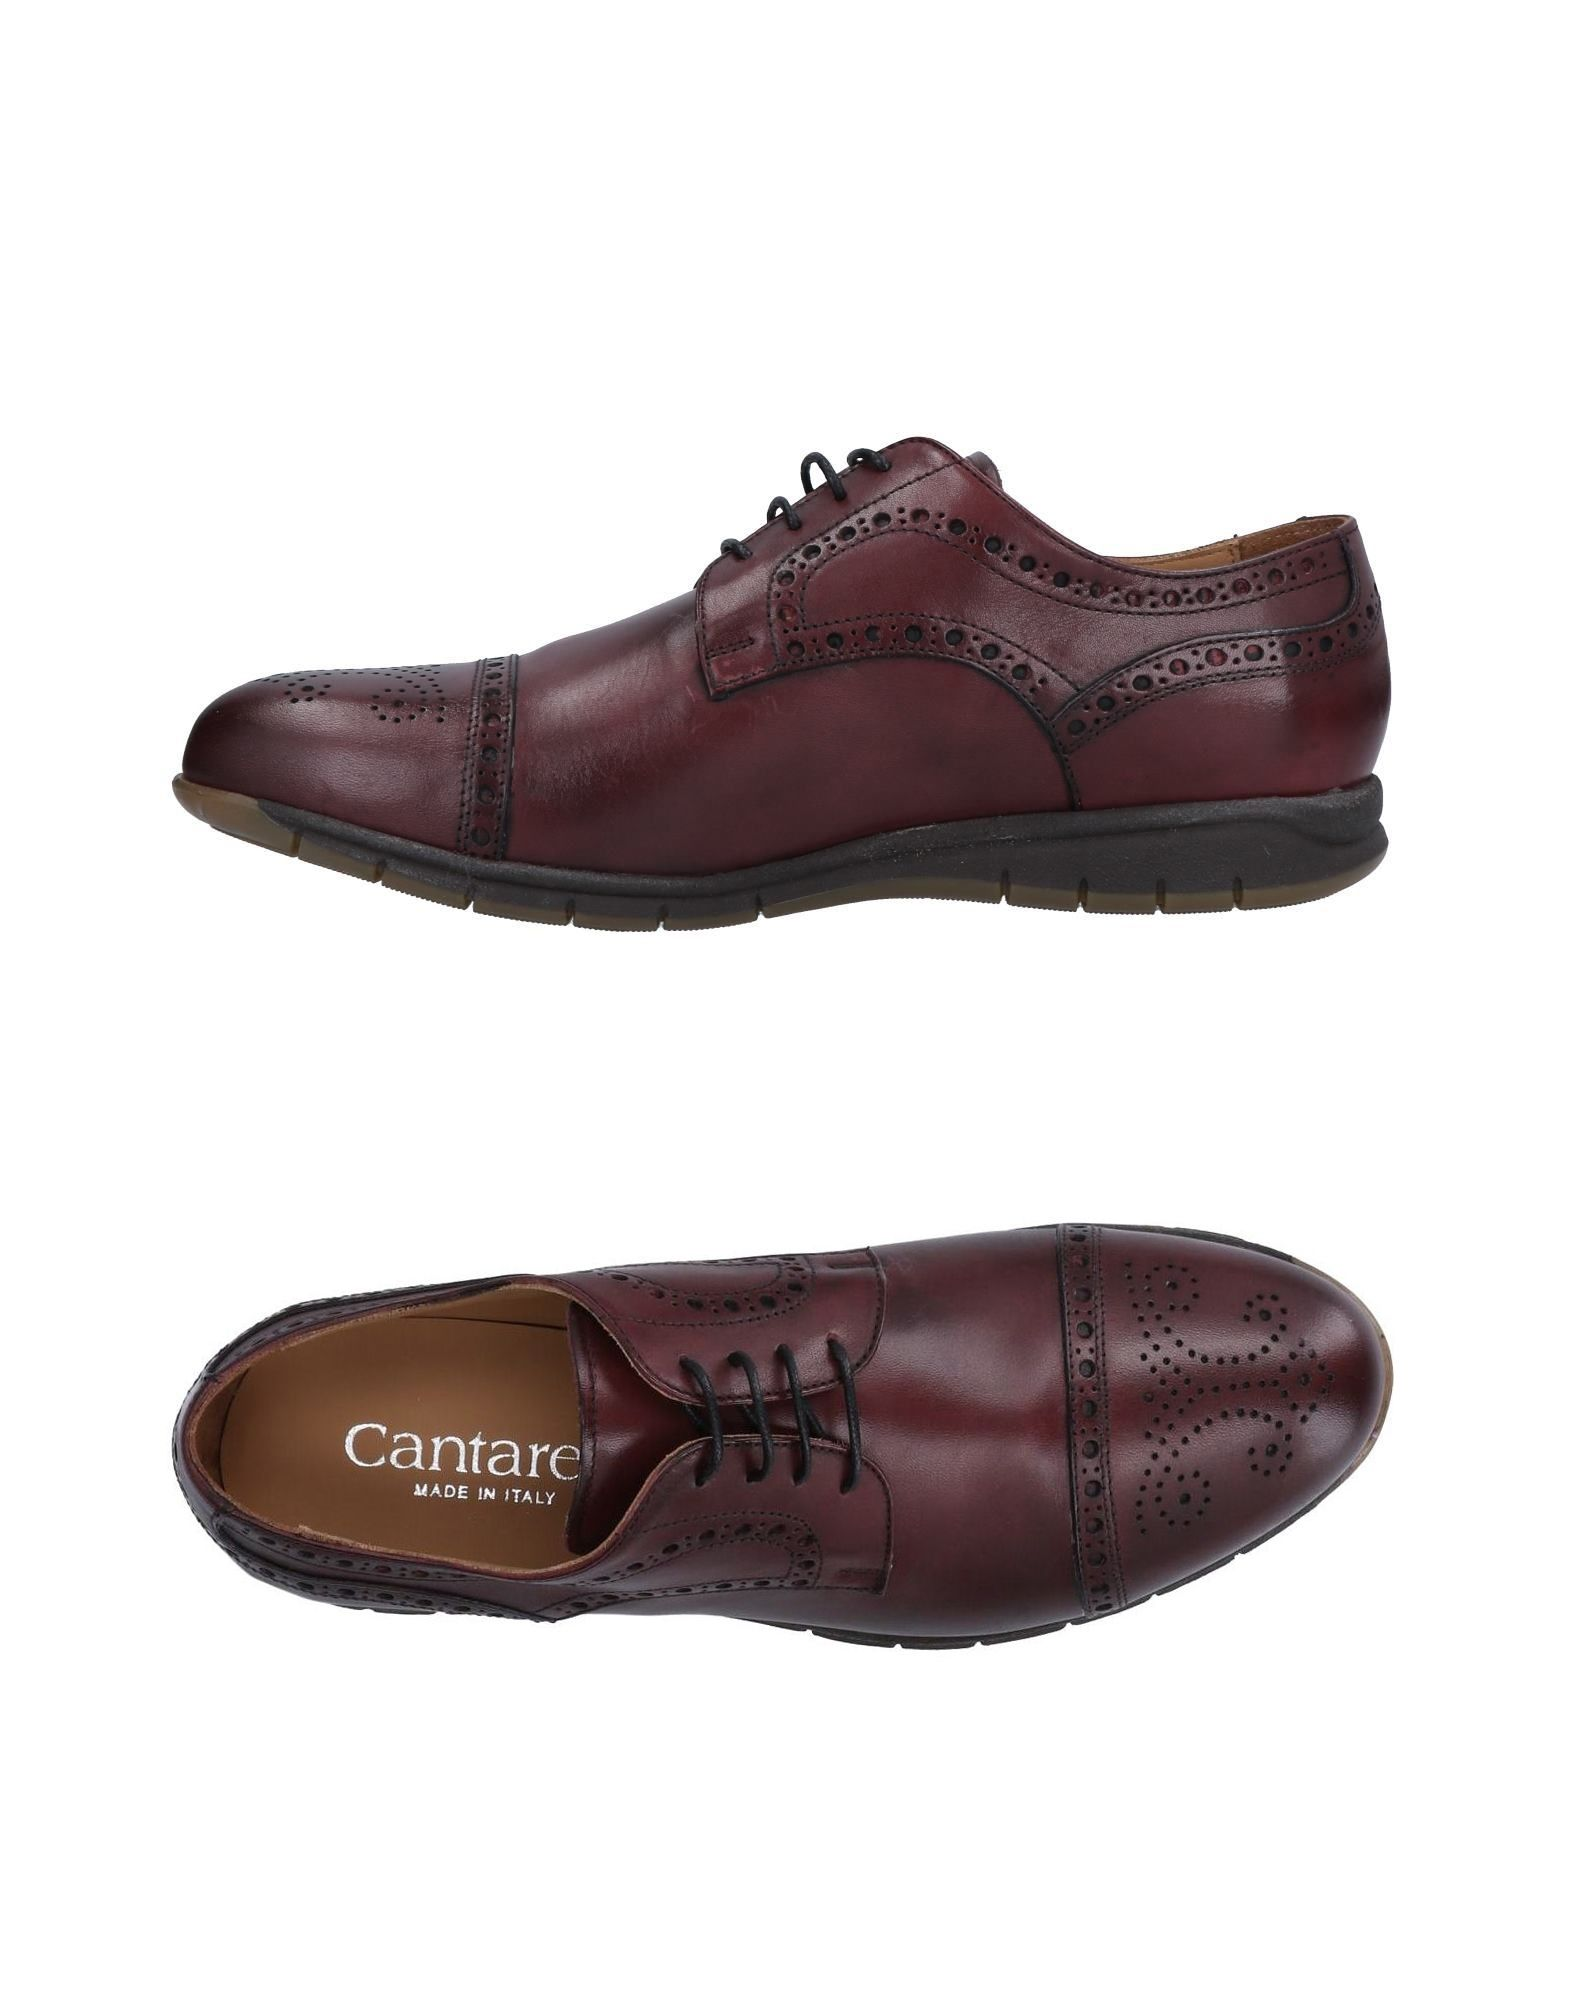 Cantarelli Schnürschuhe Herren  11502309ME Gute Qualität beliebte Schuhe